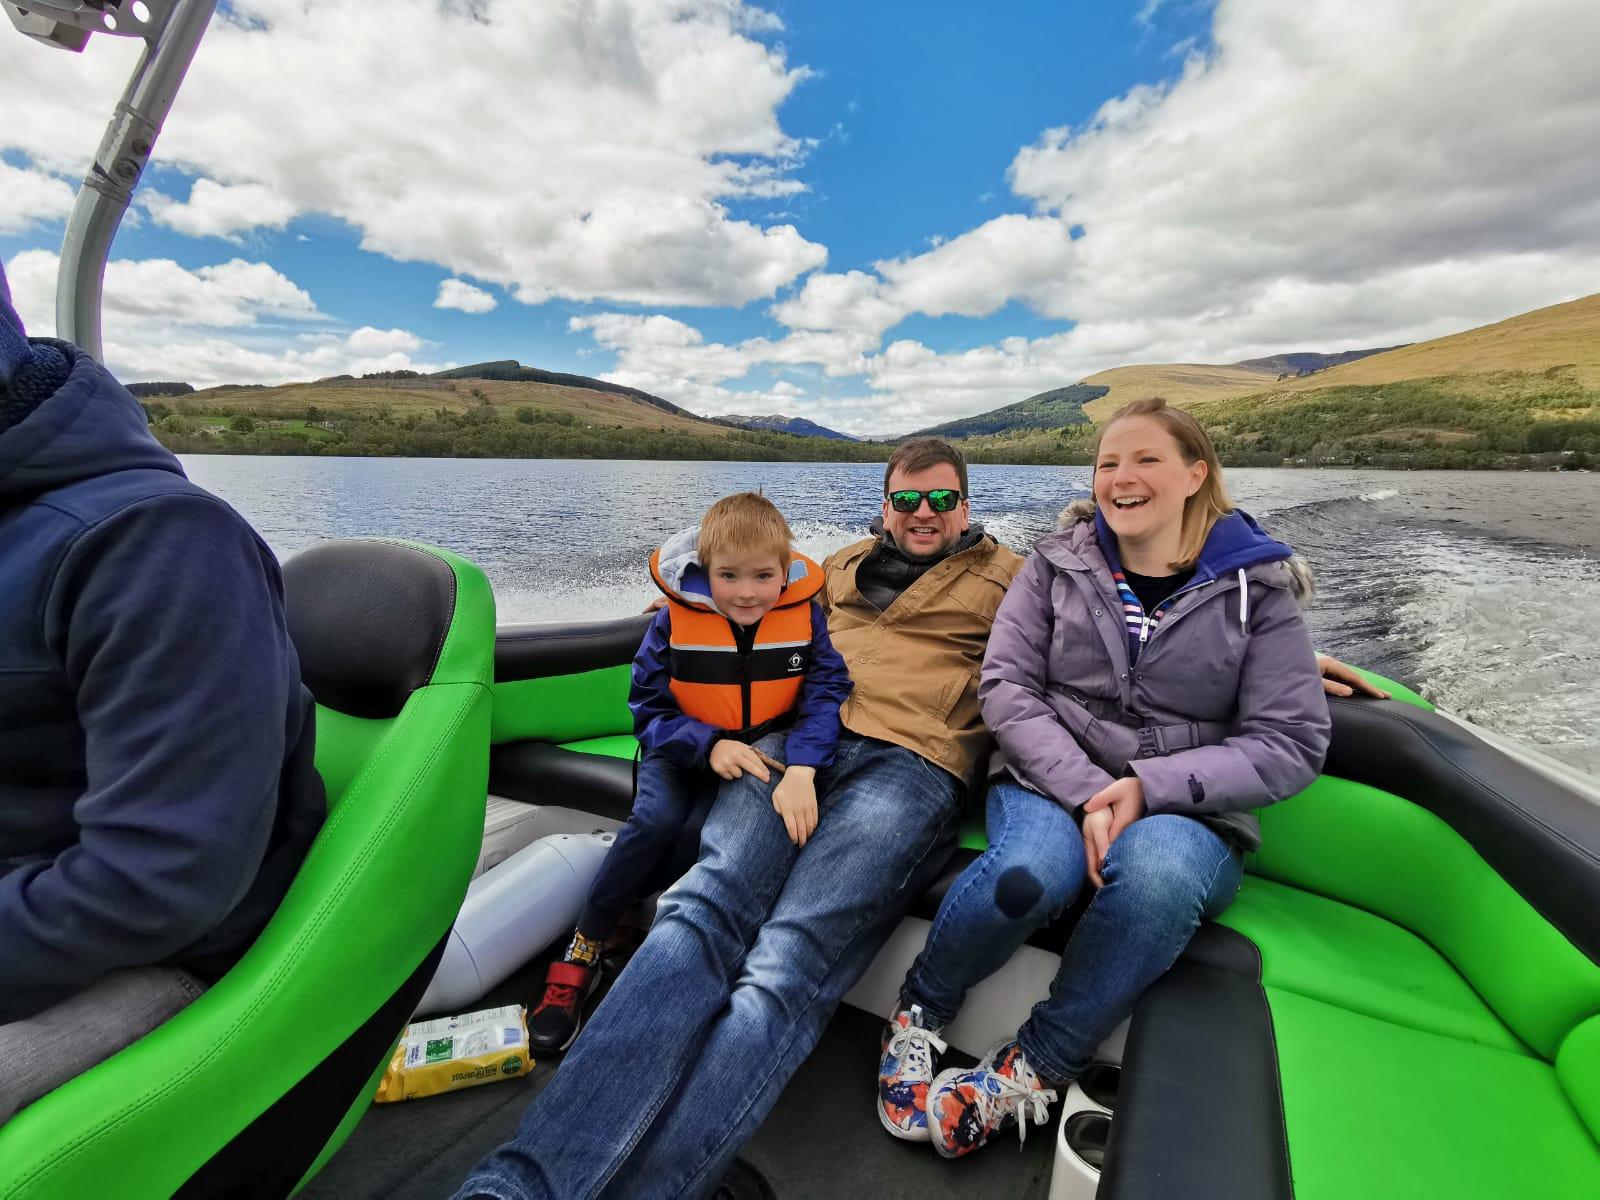 30 minute Speed boat trip